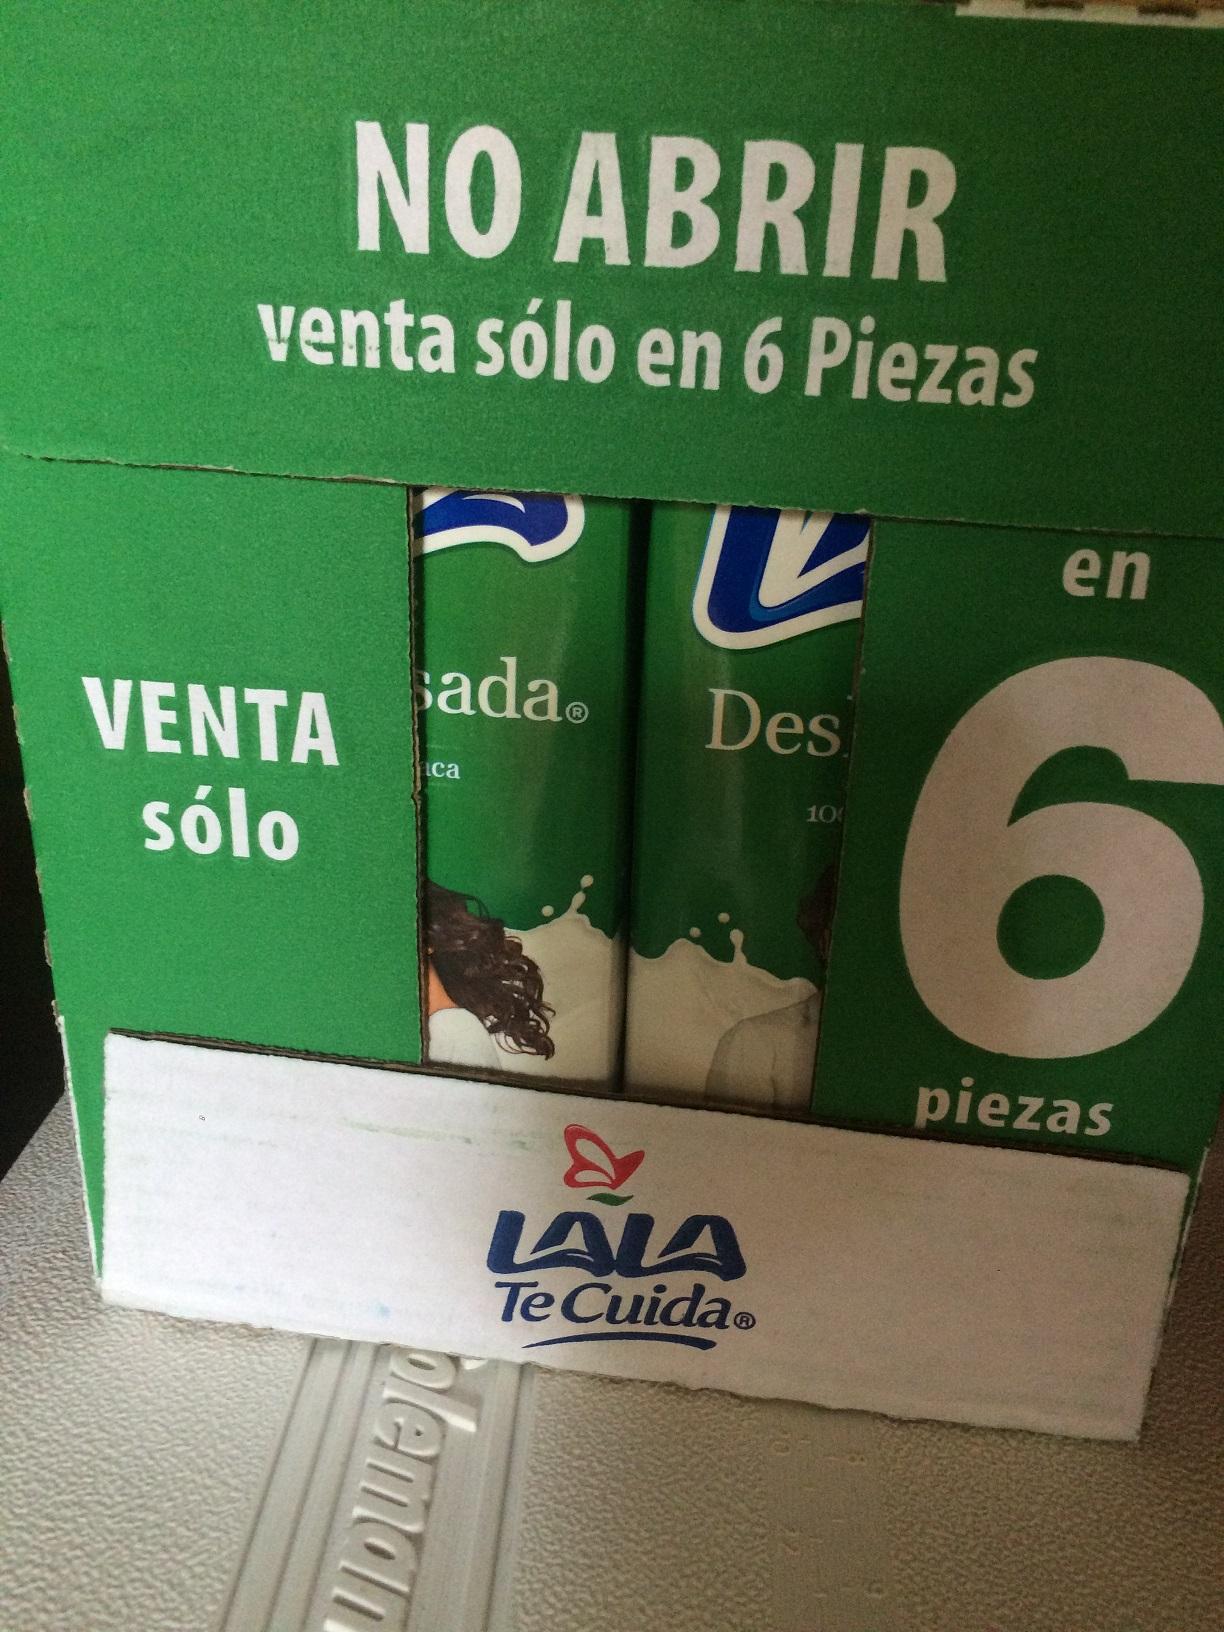 Bodega Aurrera: Leche LALA deslactosada 6 litros x $95